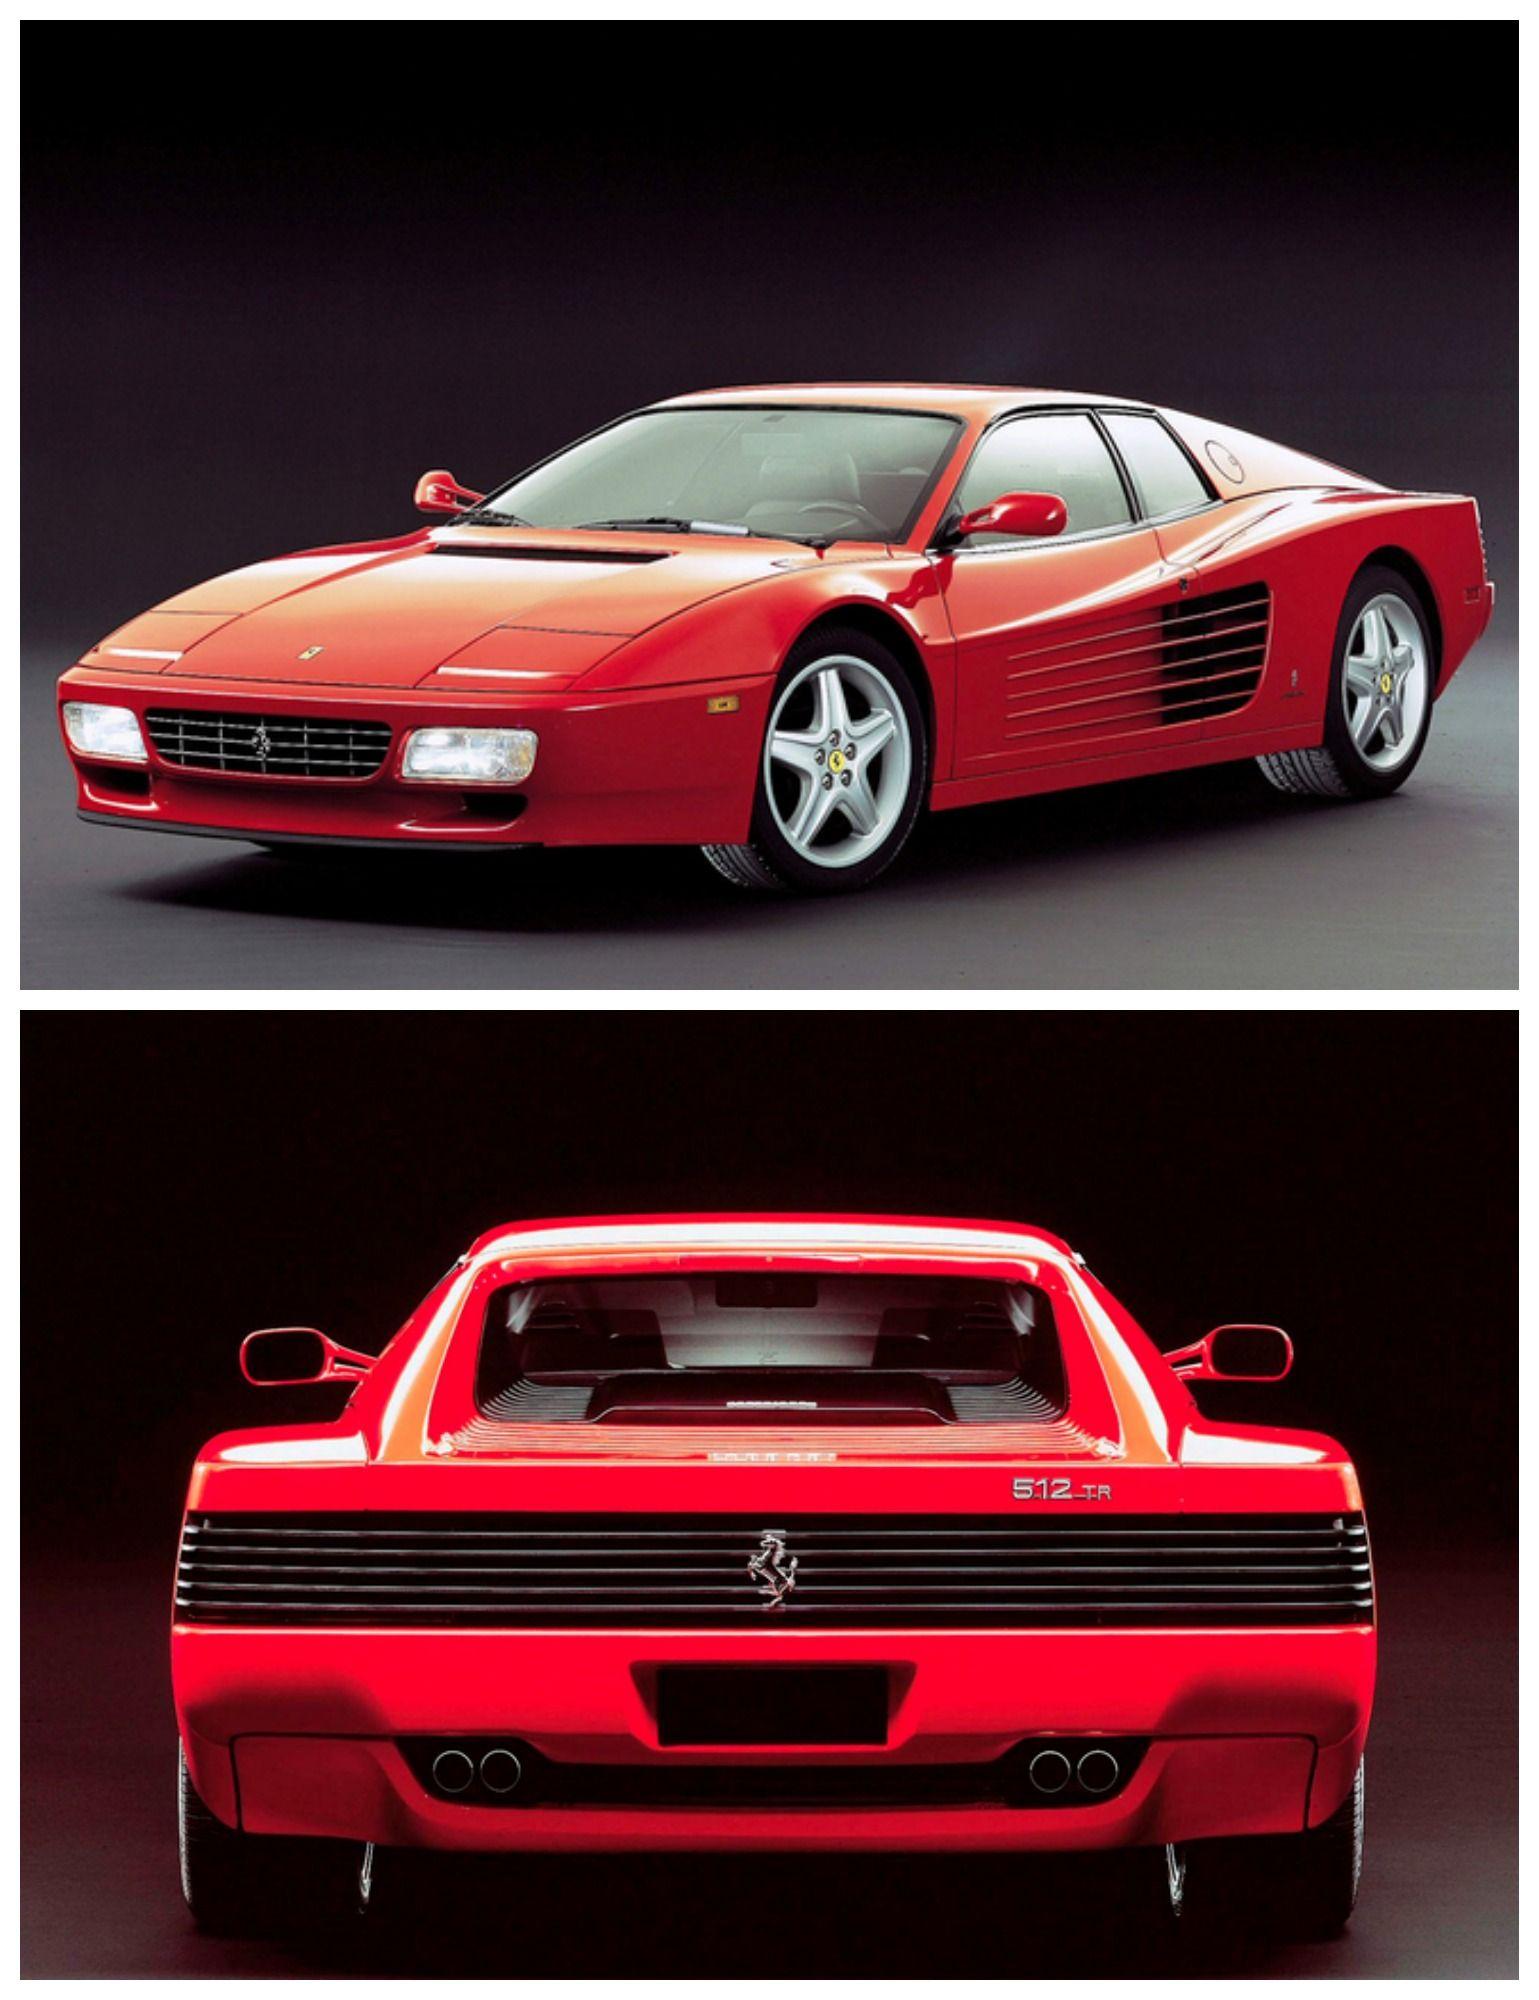 The Iconic Ferrari Testarossa symbolic of the 80's